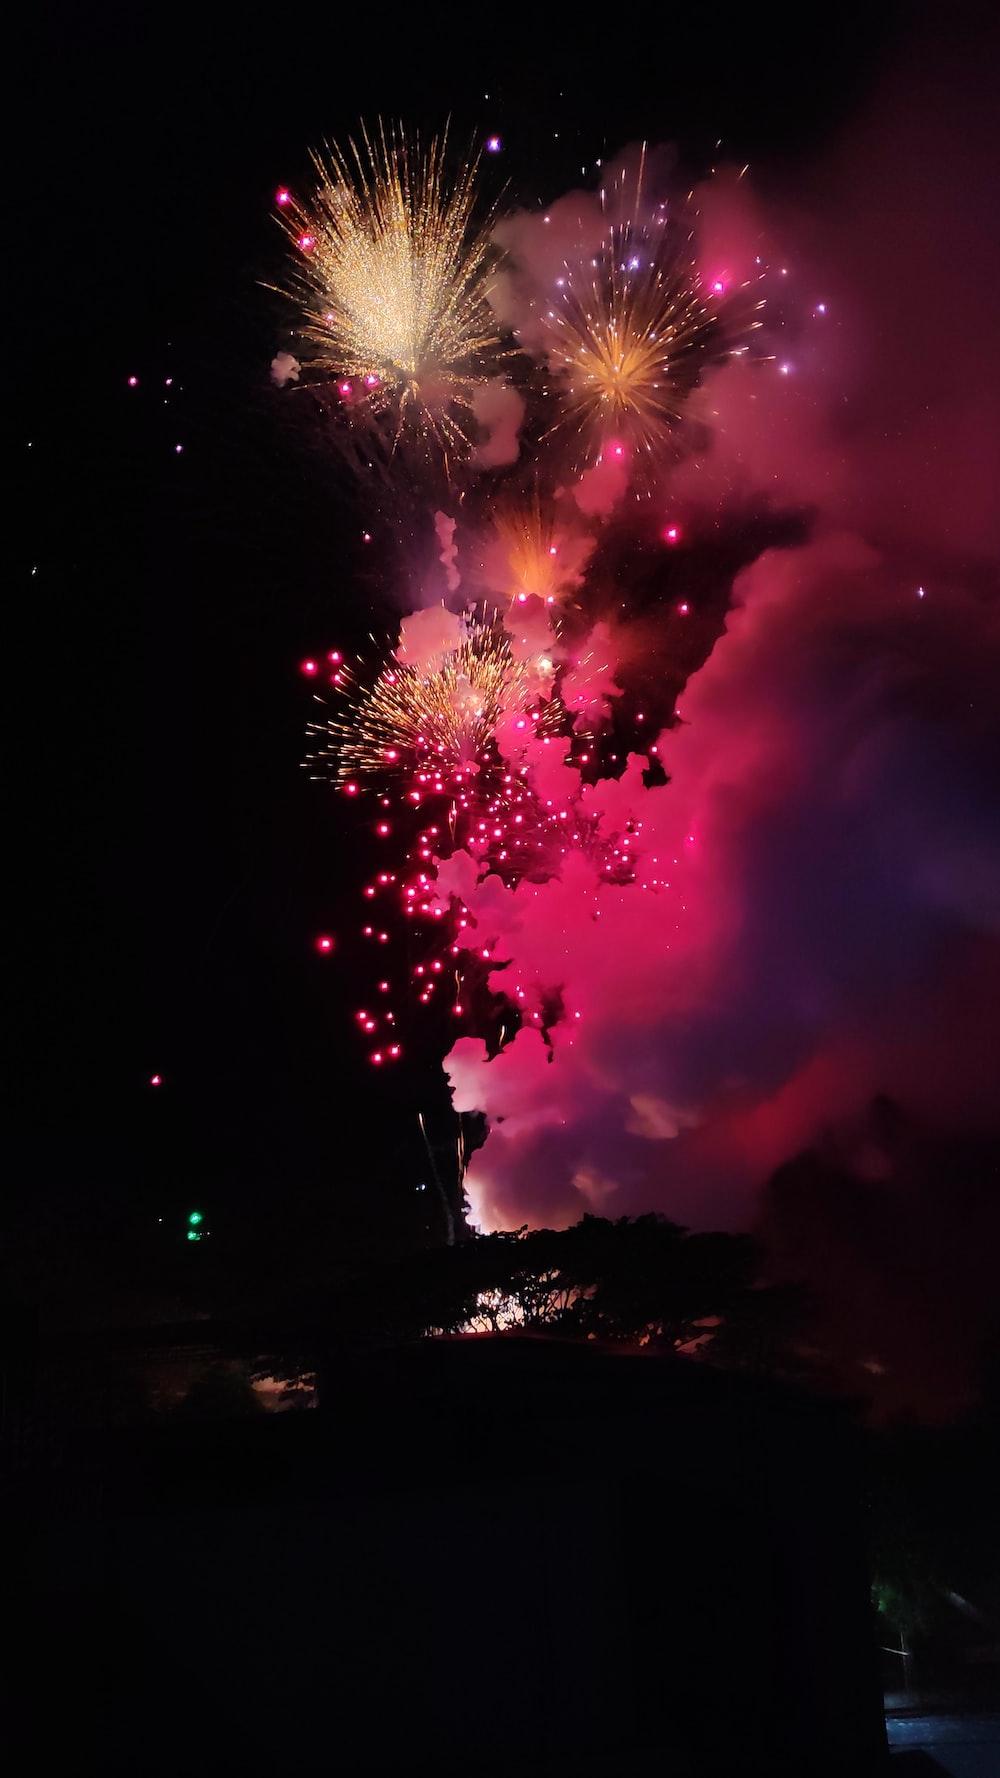 firecrackers during nighttime